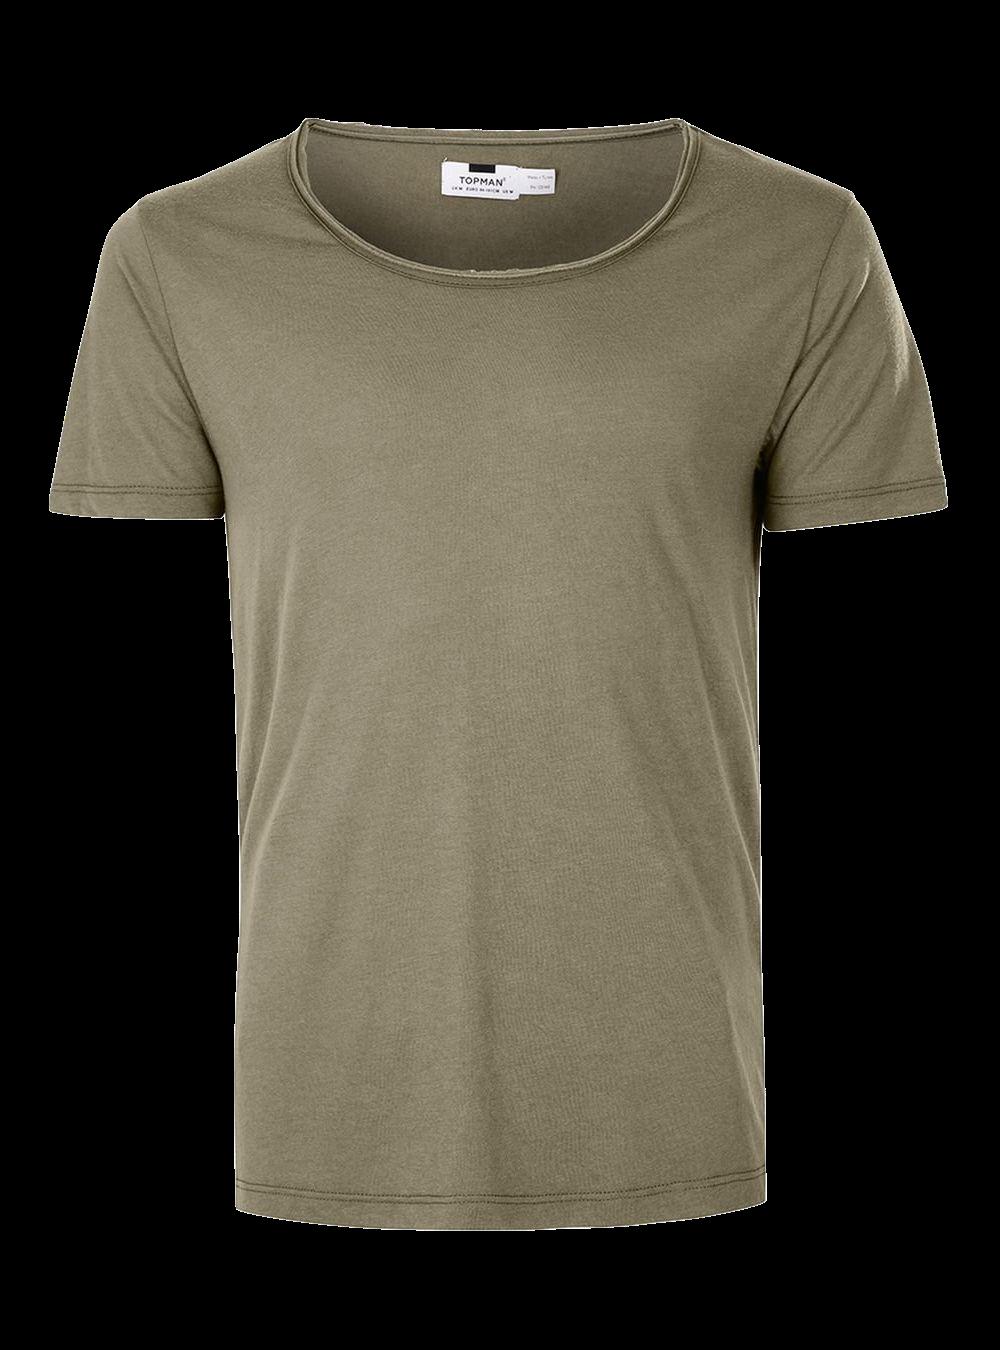 topman khaki scoop neck tshirt